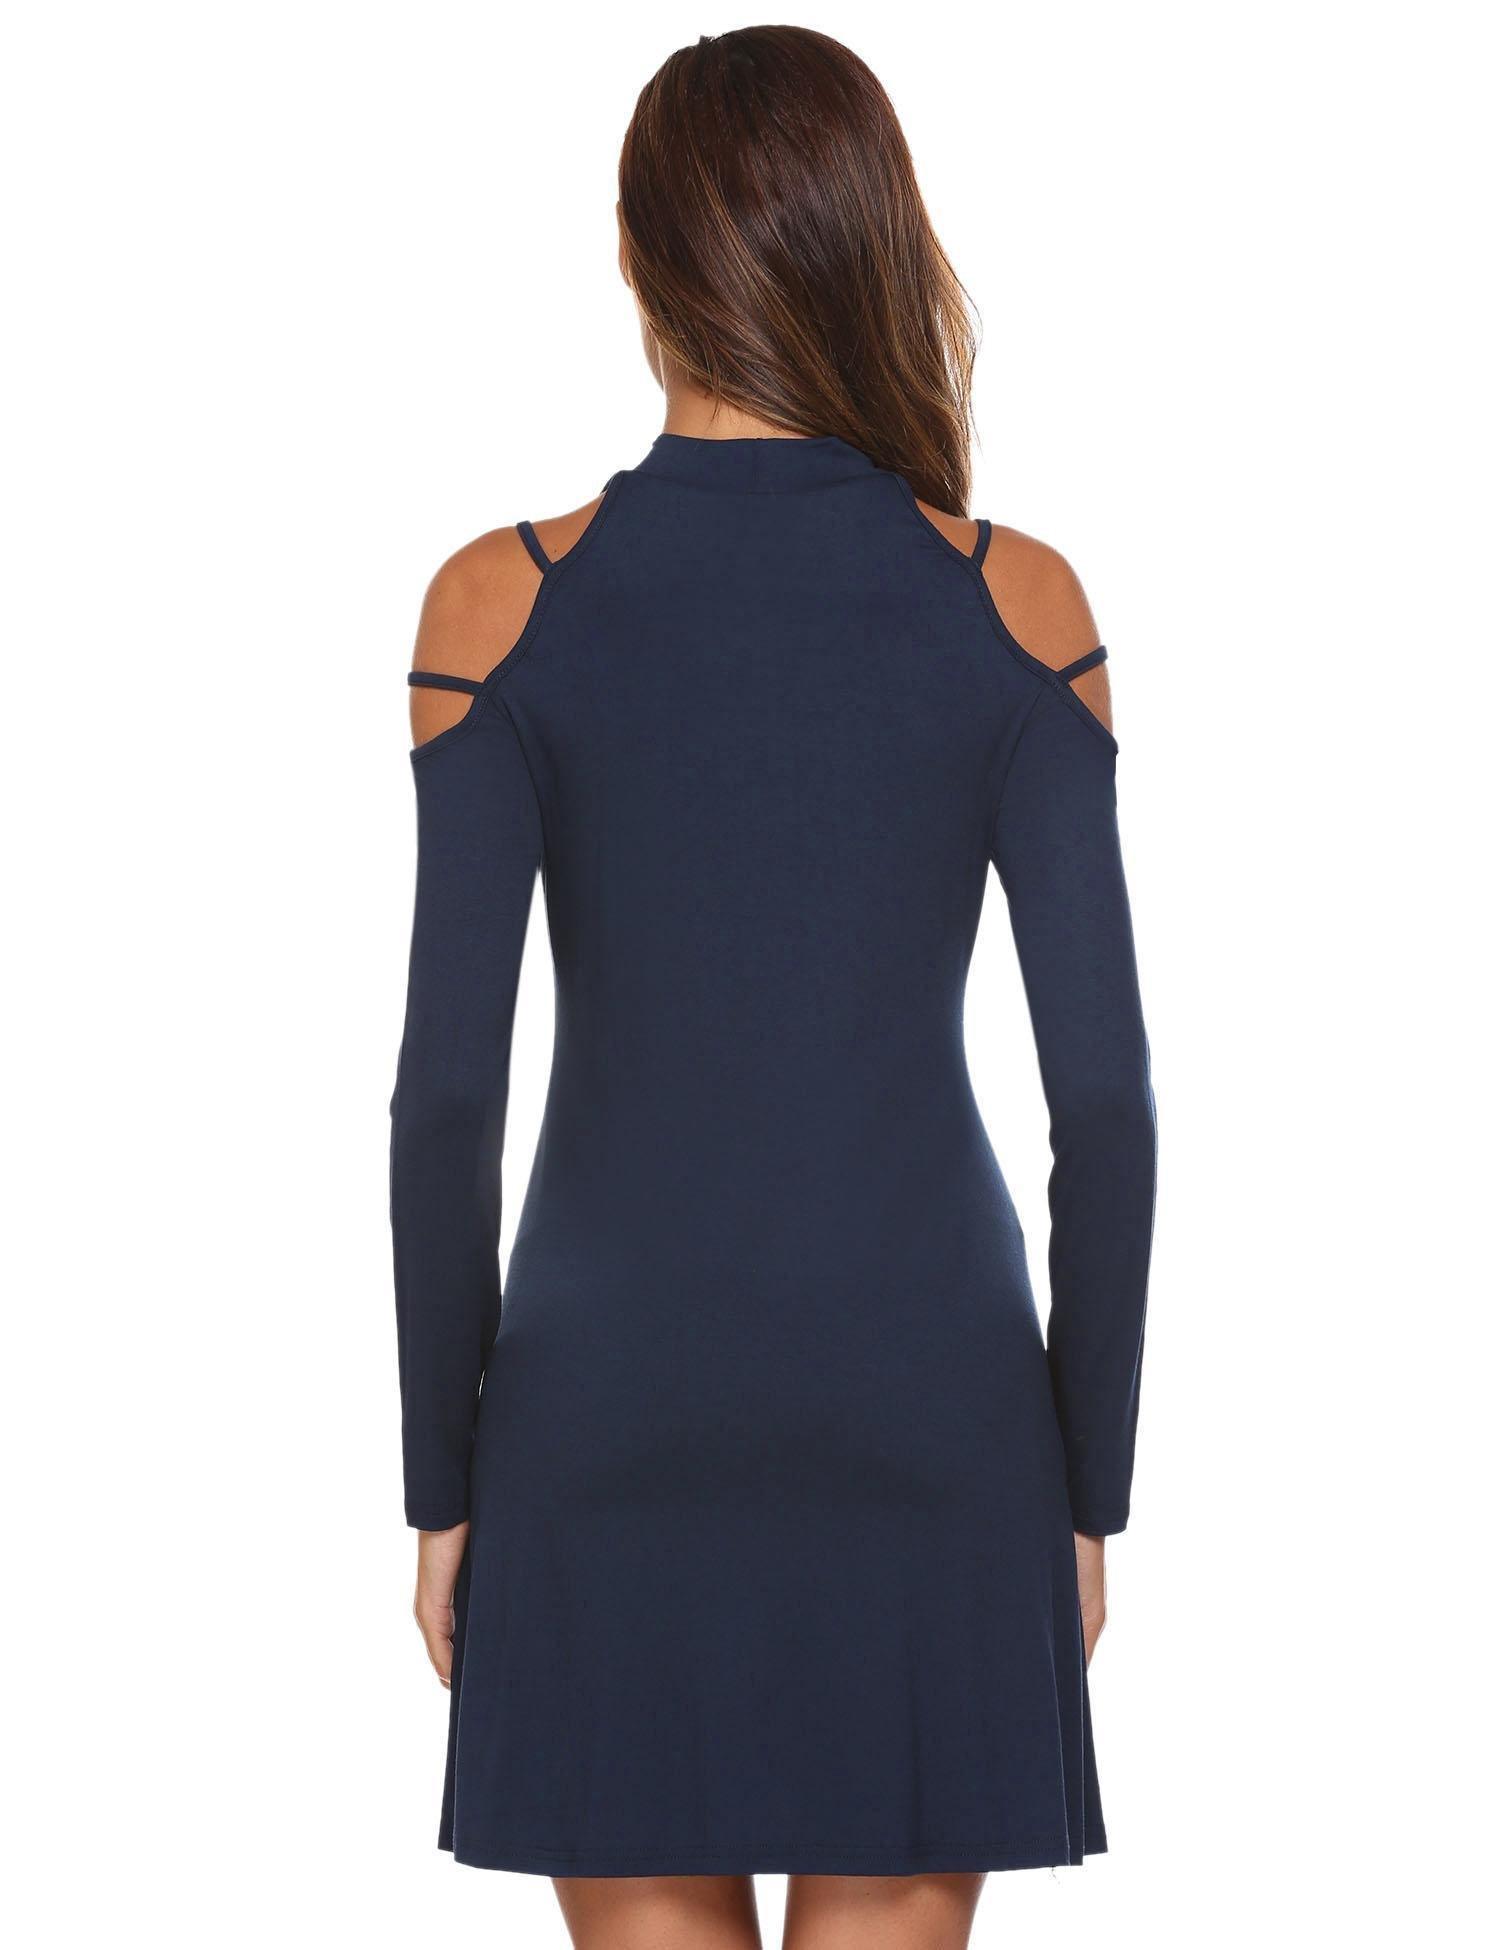 Misakia Women's Summer Cold Shoulder Tunic Top Swing T-Shirt Loose Dress (Navy Blue XL) by Misakia (Image #5)